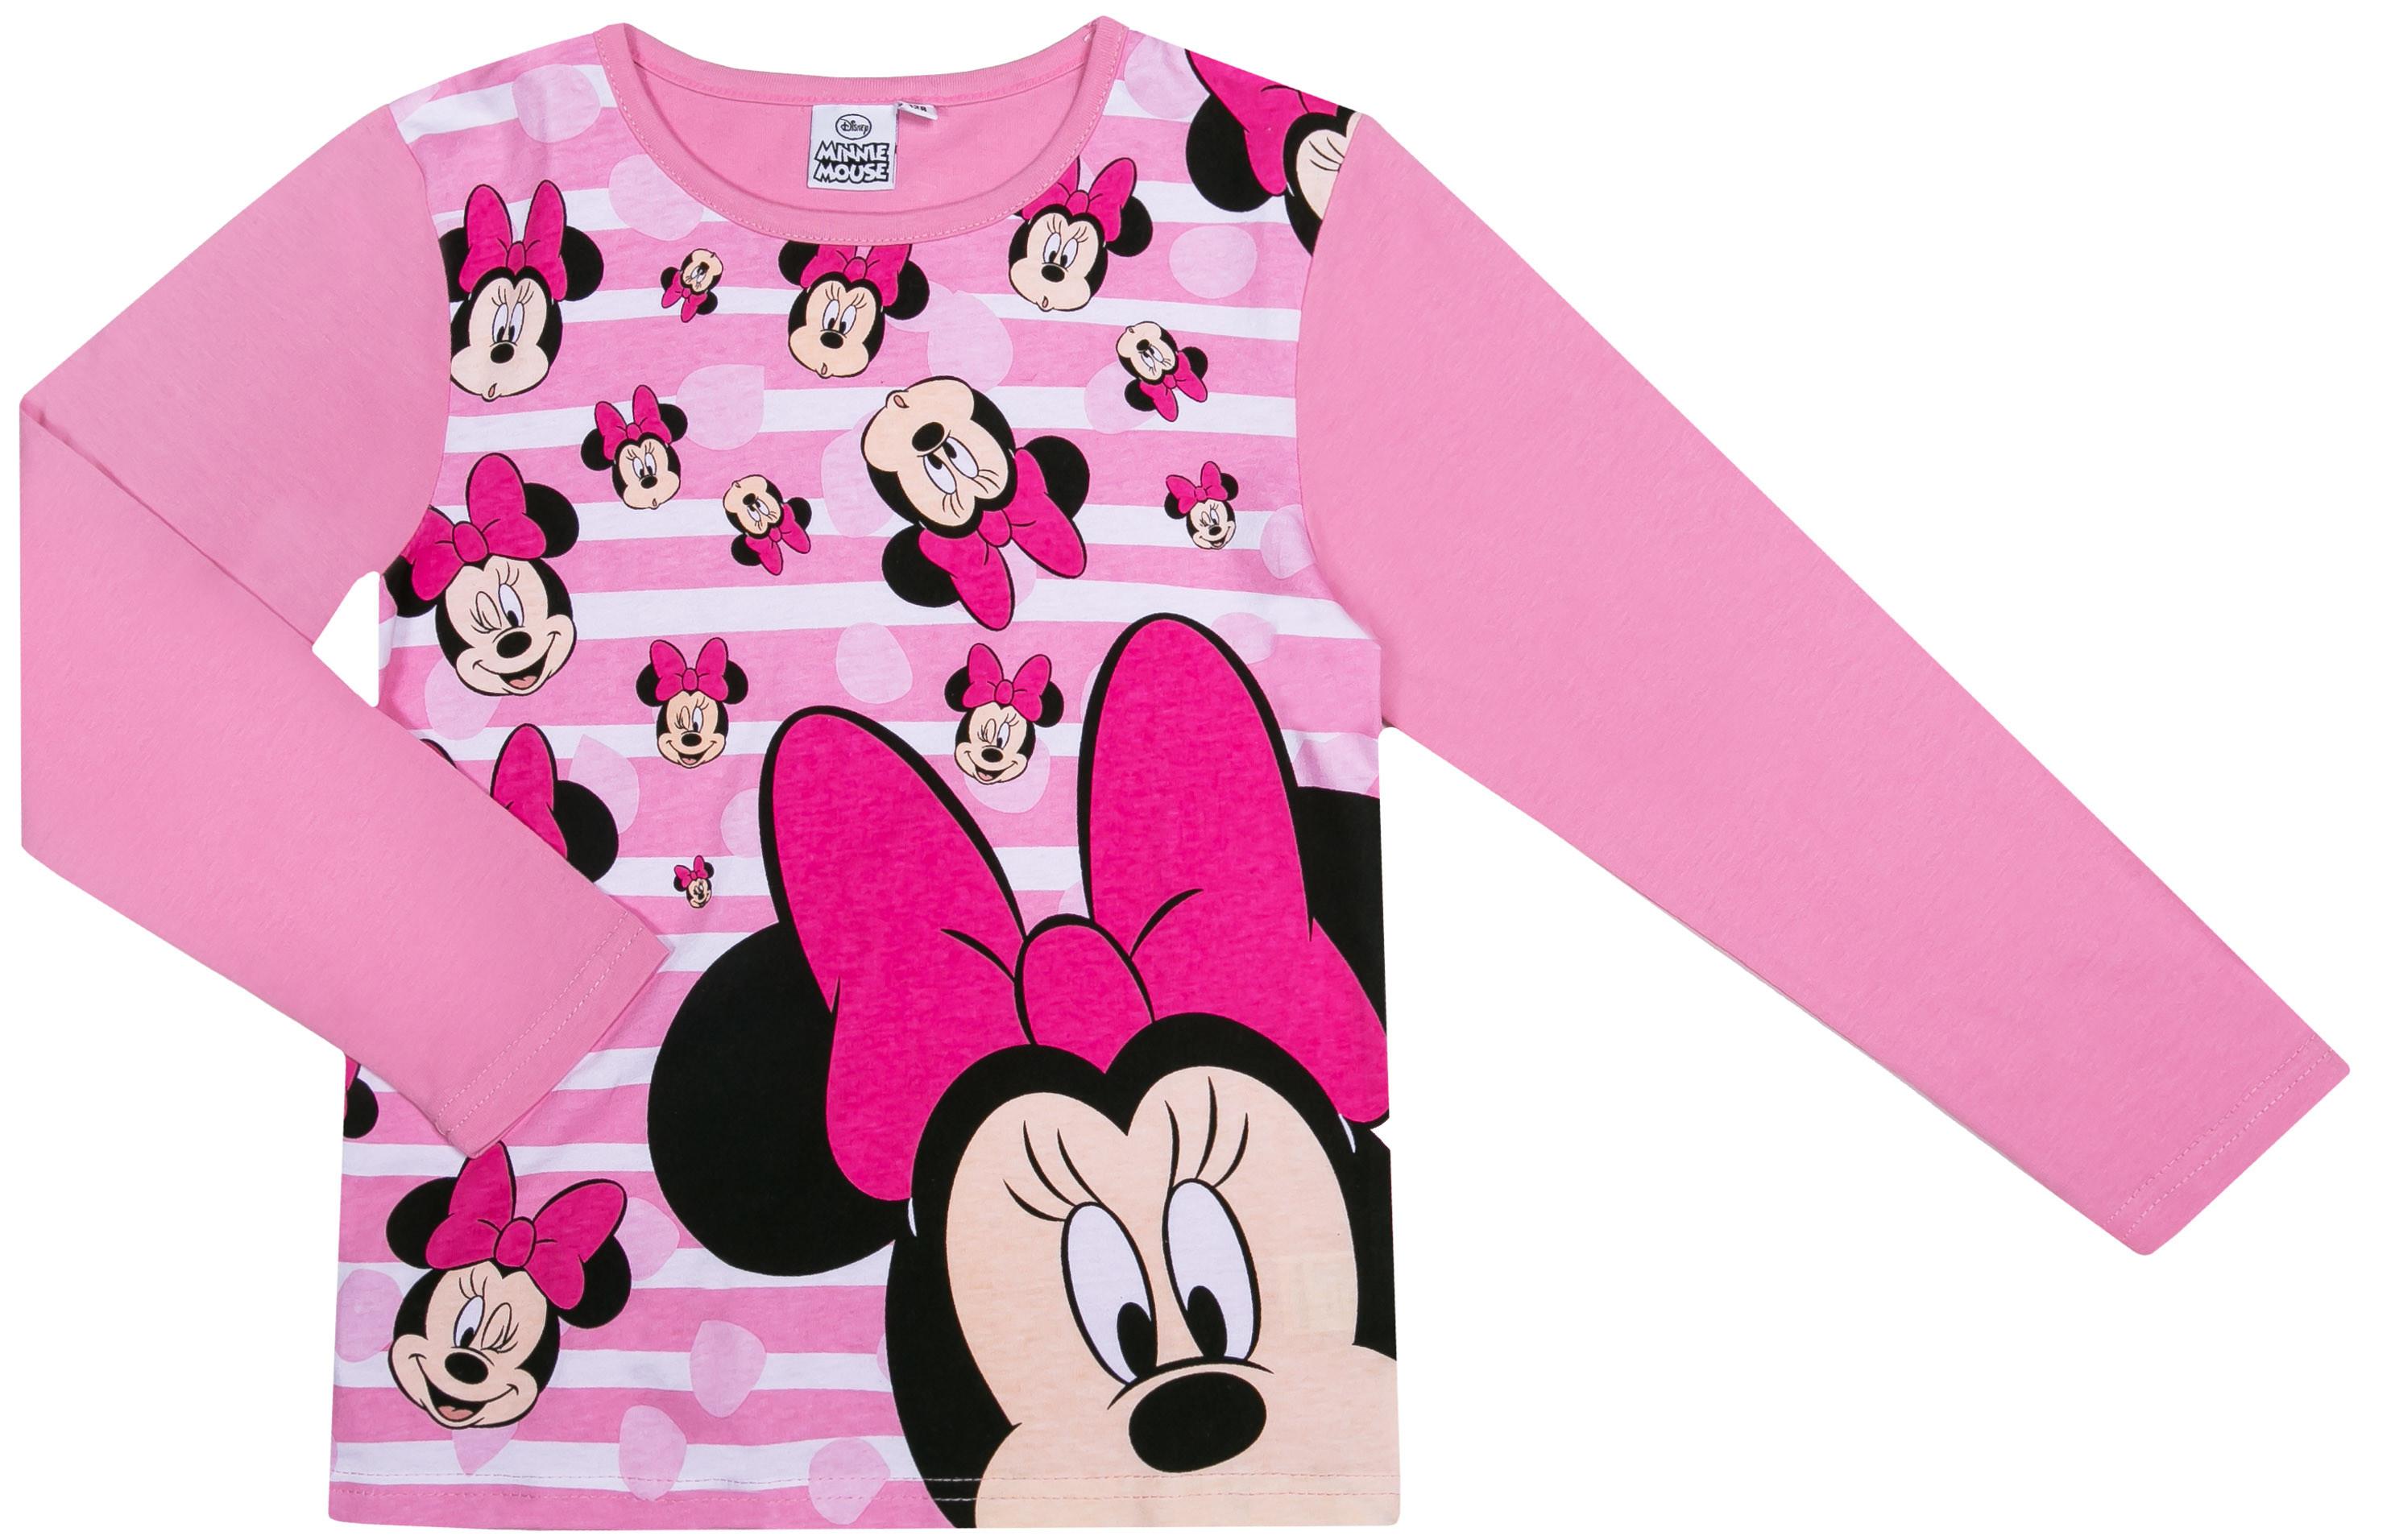 Пижамы Disney minnie Пижама для девочки Minnie Mouse, розовая пижама